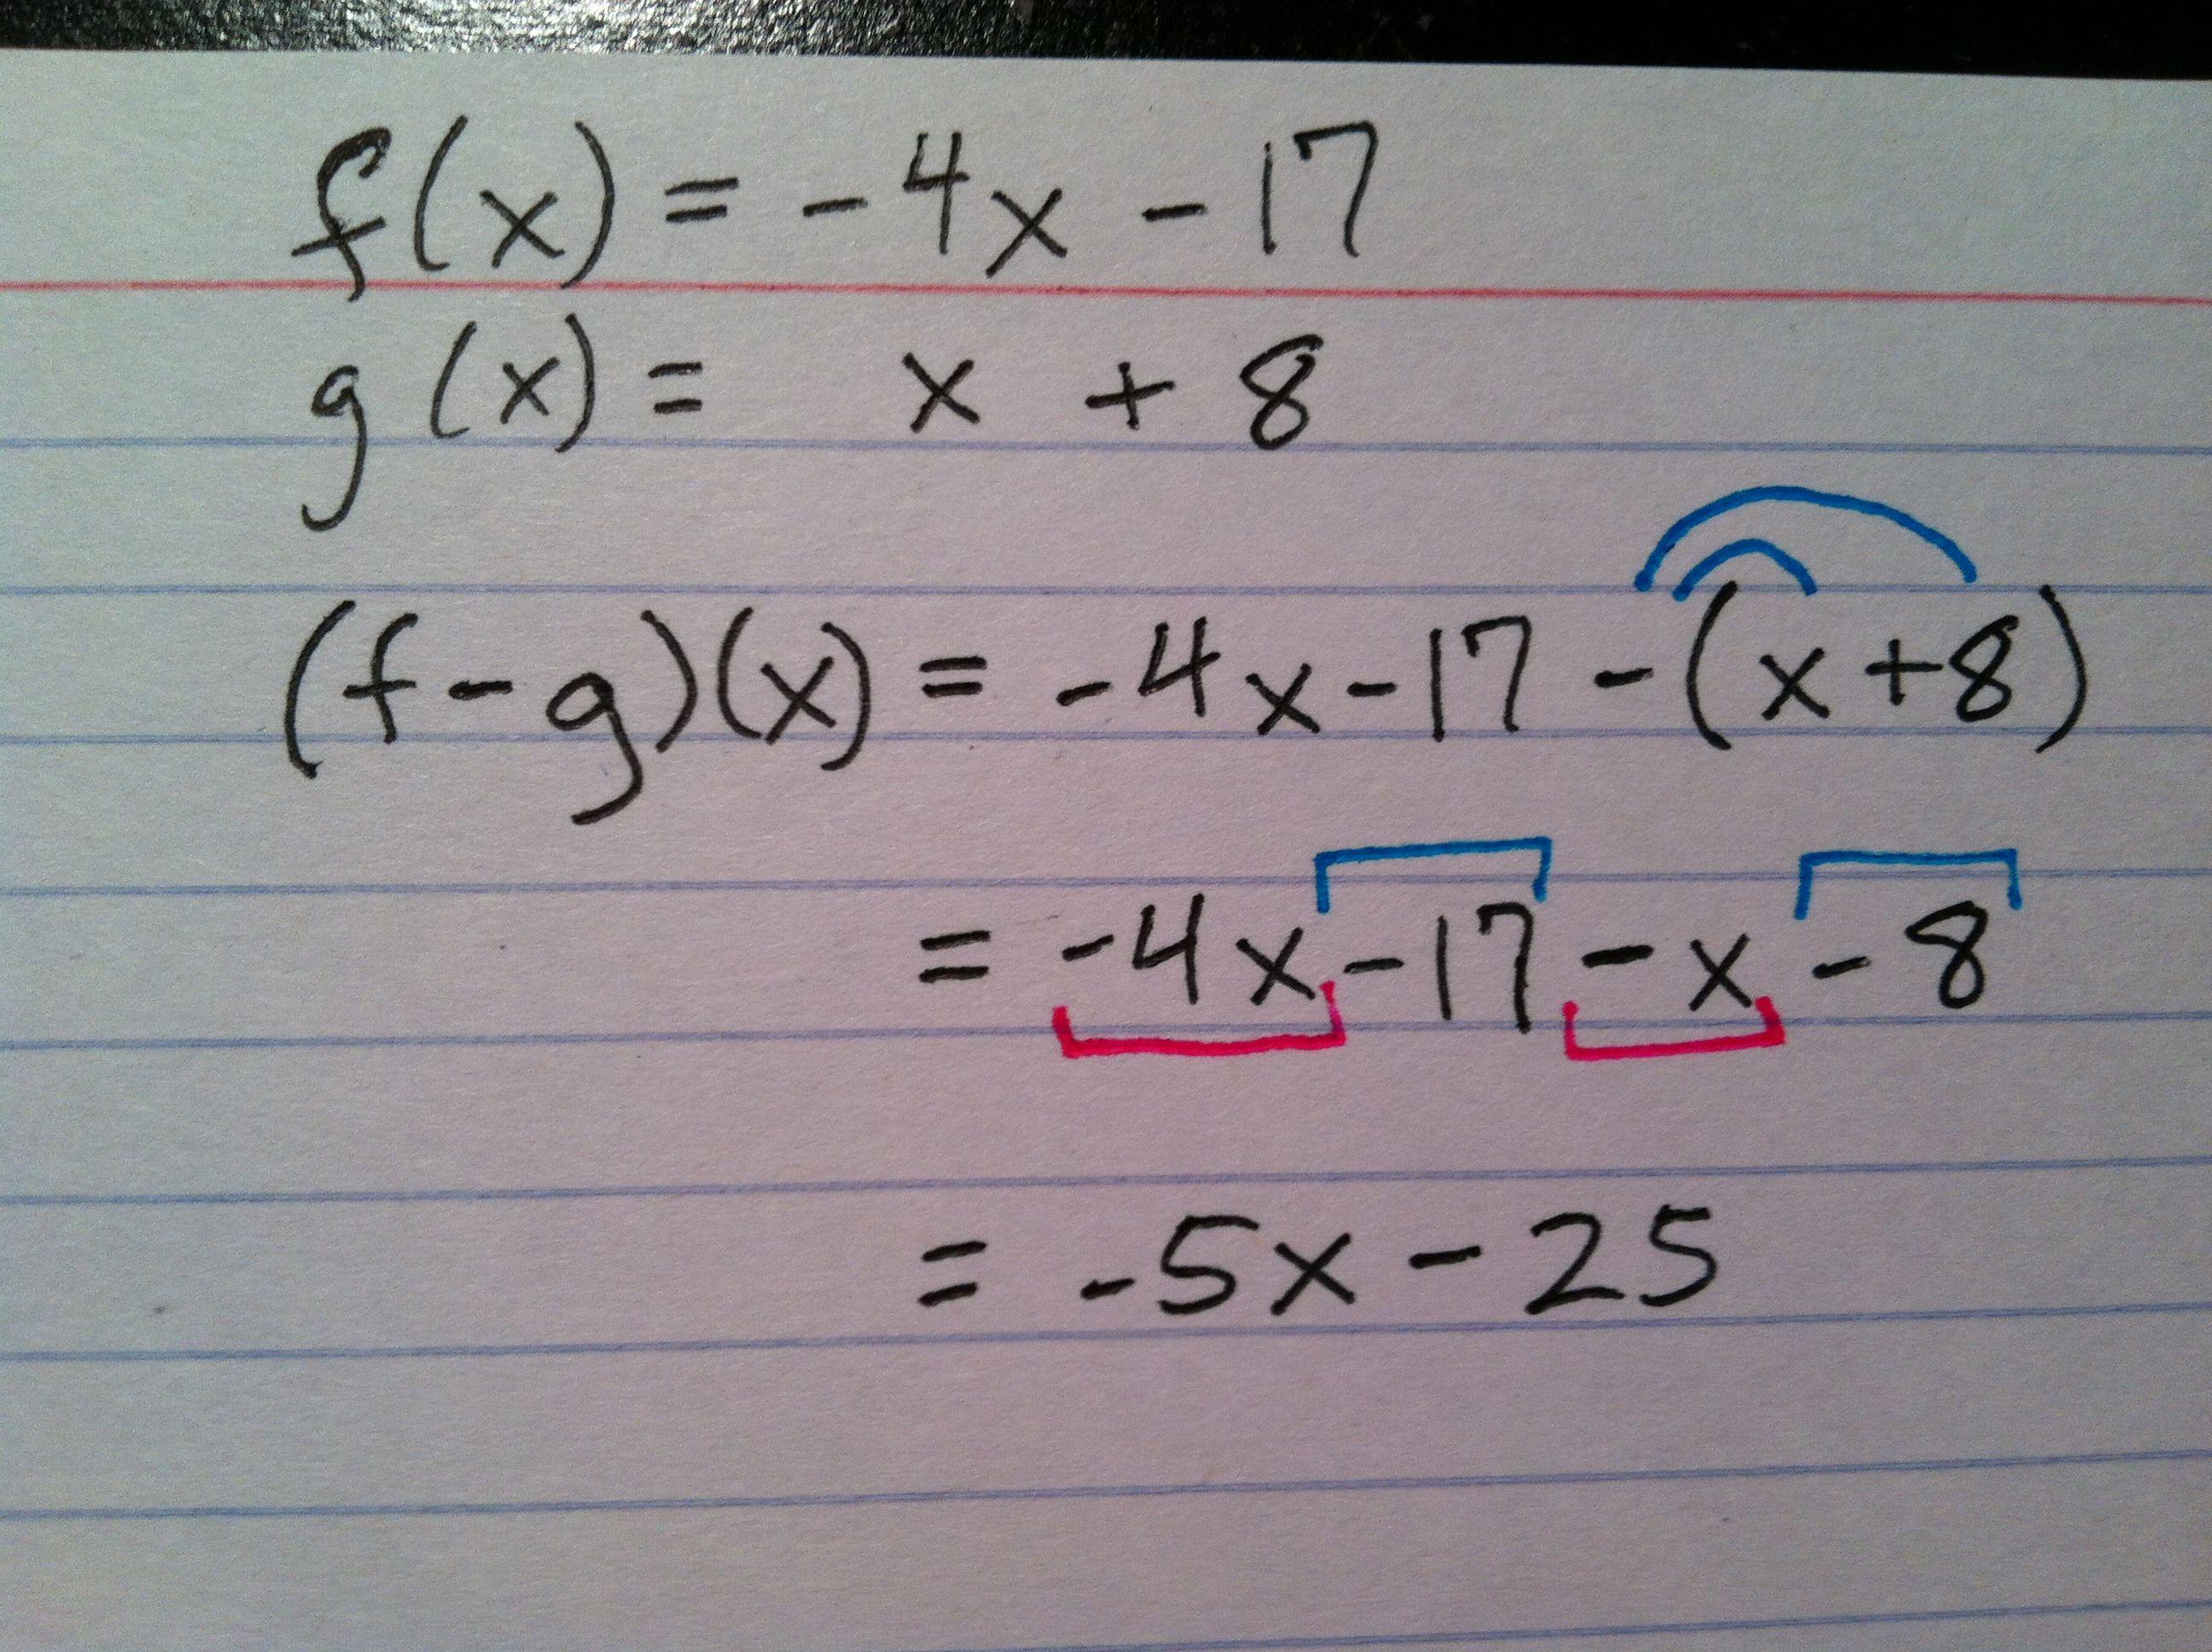 Subtraction Of 2 Functions Algebra Math Math Equations [ 1936 x 2592 Pixel ]